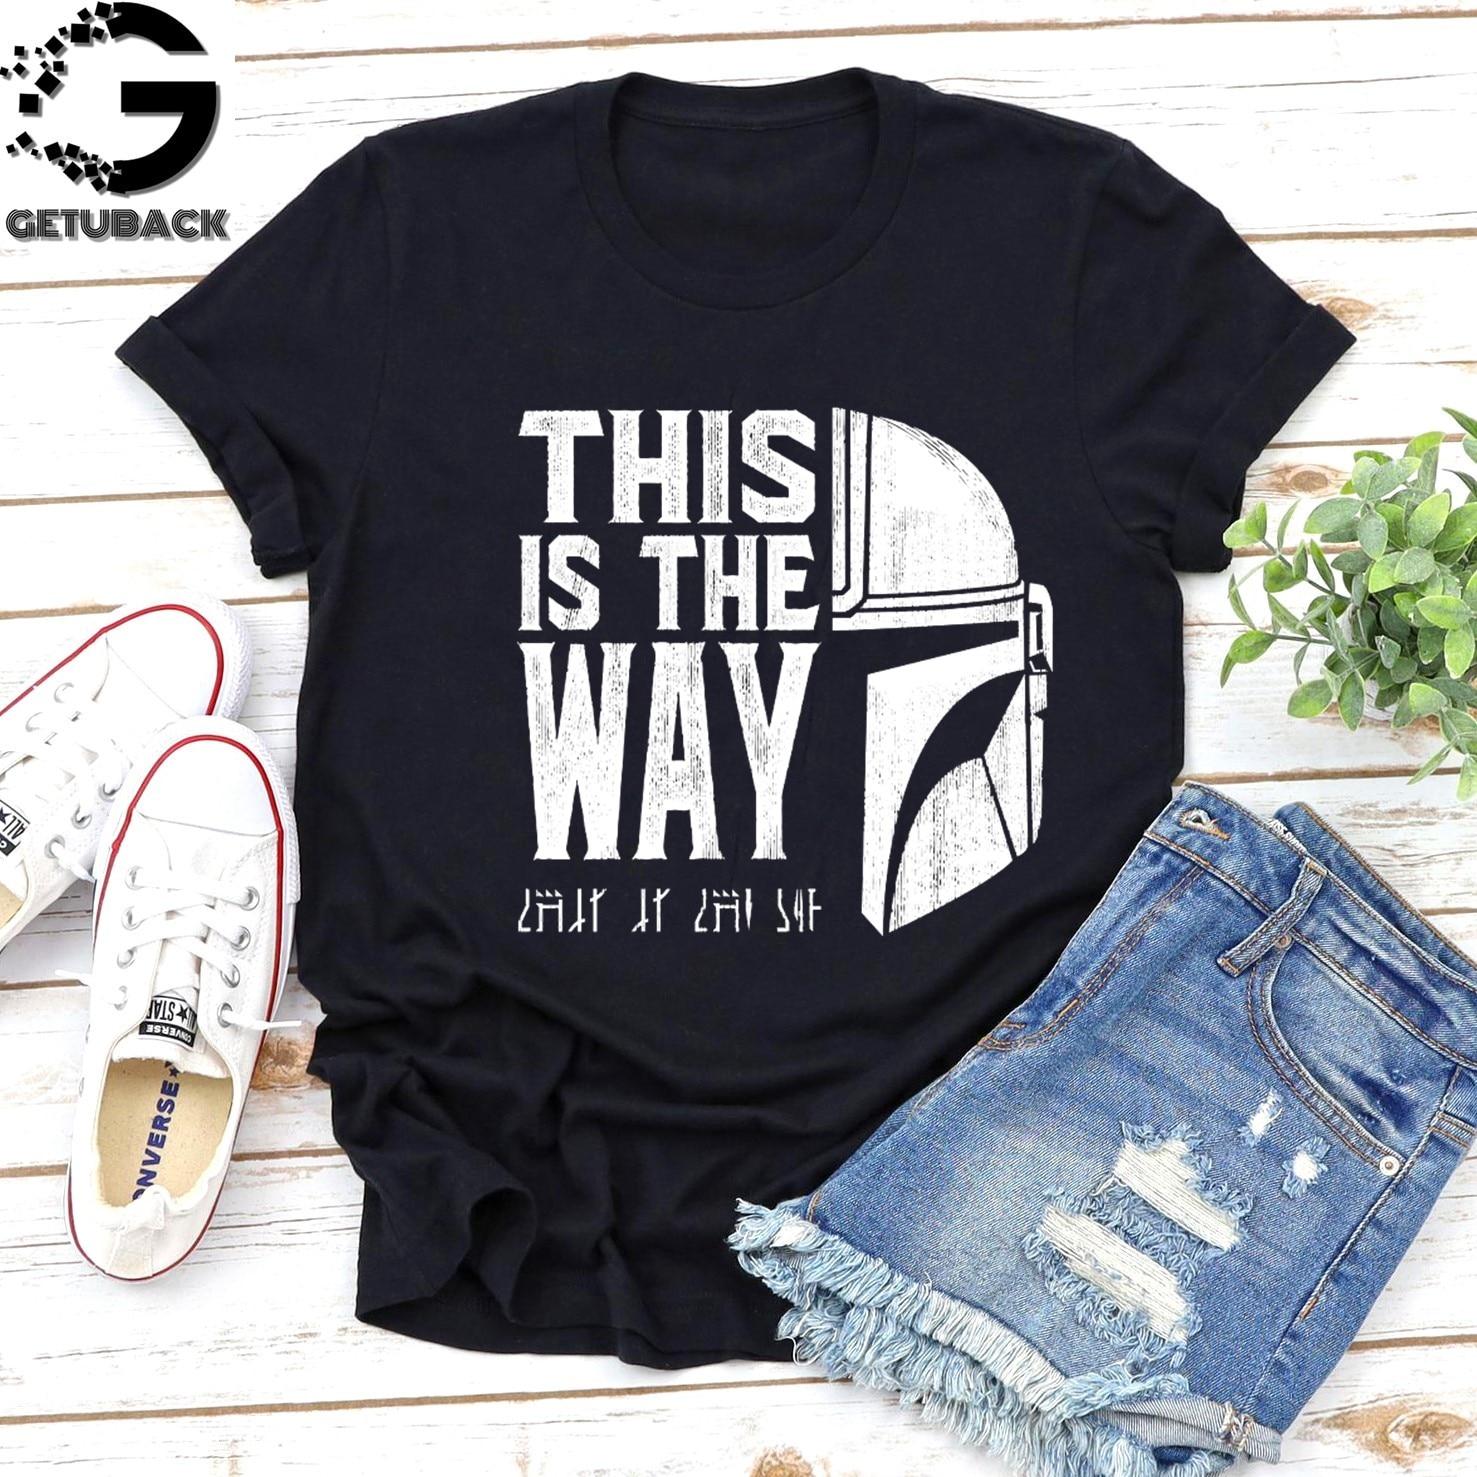 Women's Star Wars The Mandalorian Child Baby Yoda Print T-Shirt Fashion  Kawaii Girl Short Sleeve Tshirt Female Hipster Clothes